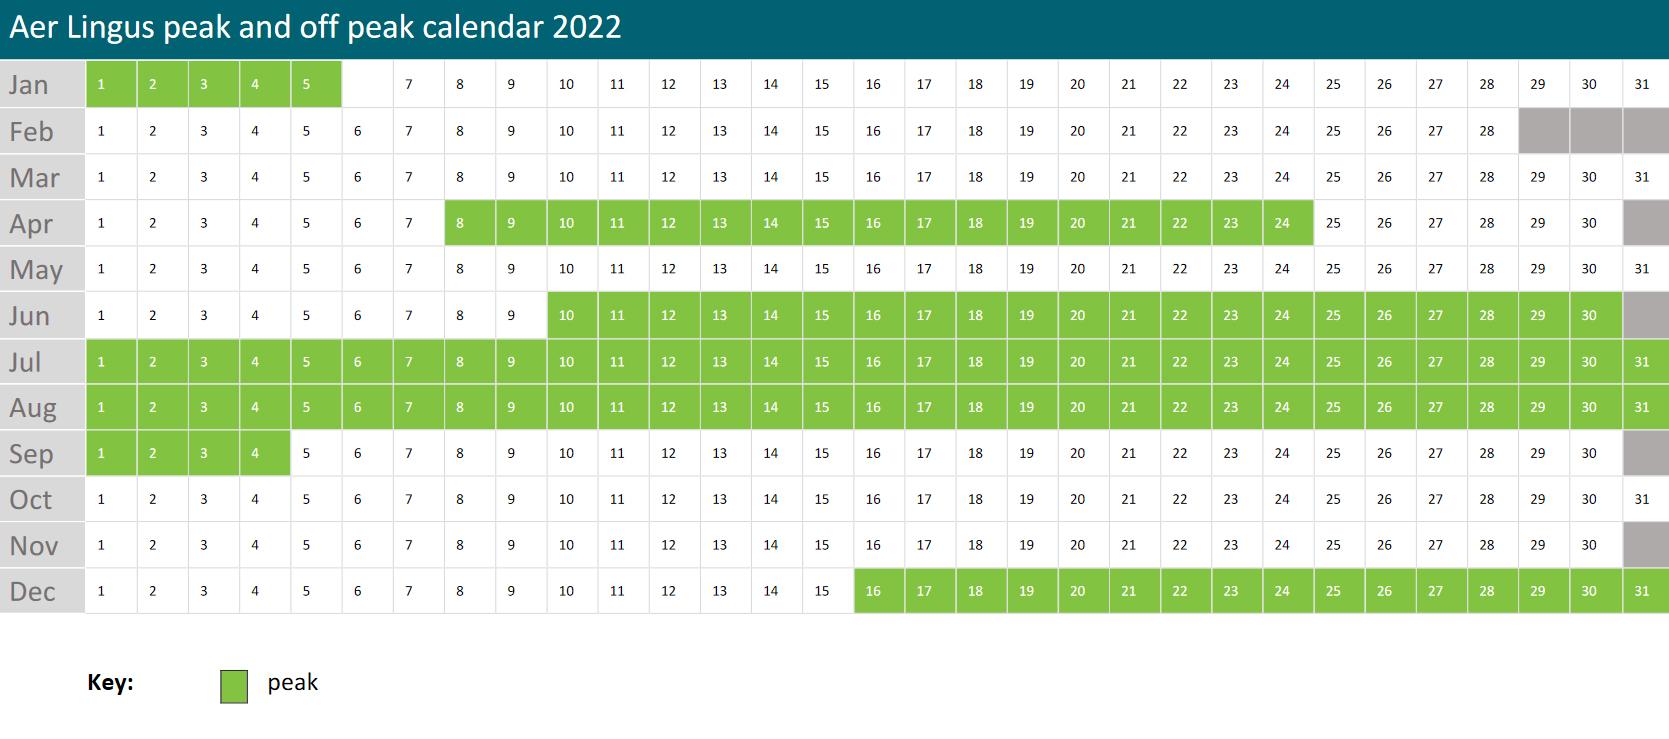 Aer Lingus peak off peak Avios redemption 2022